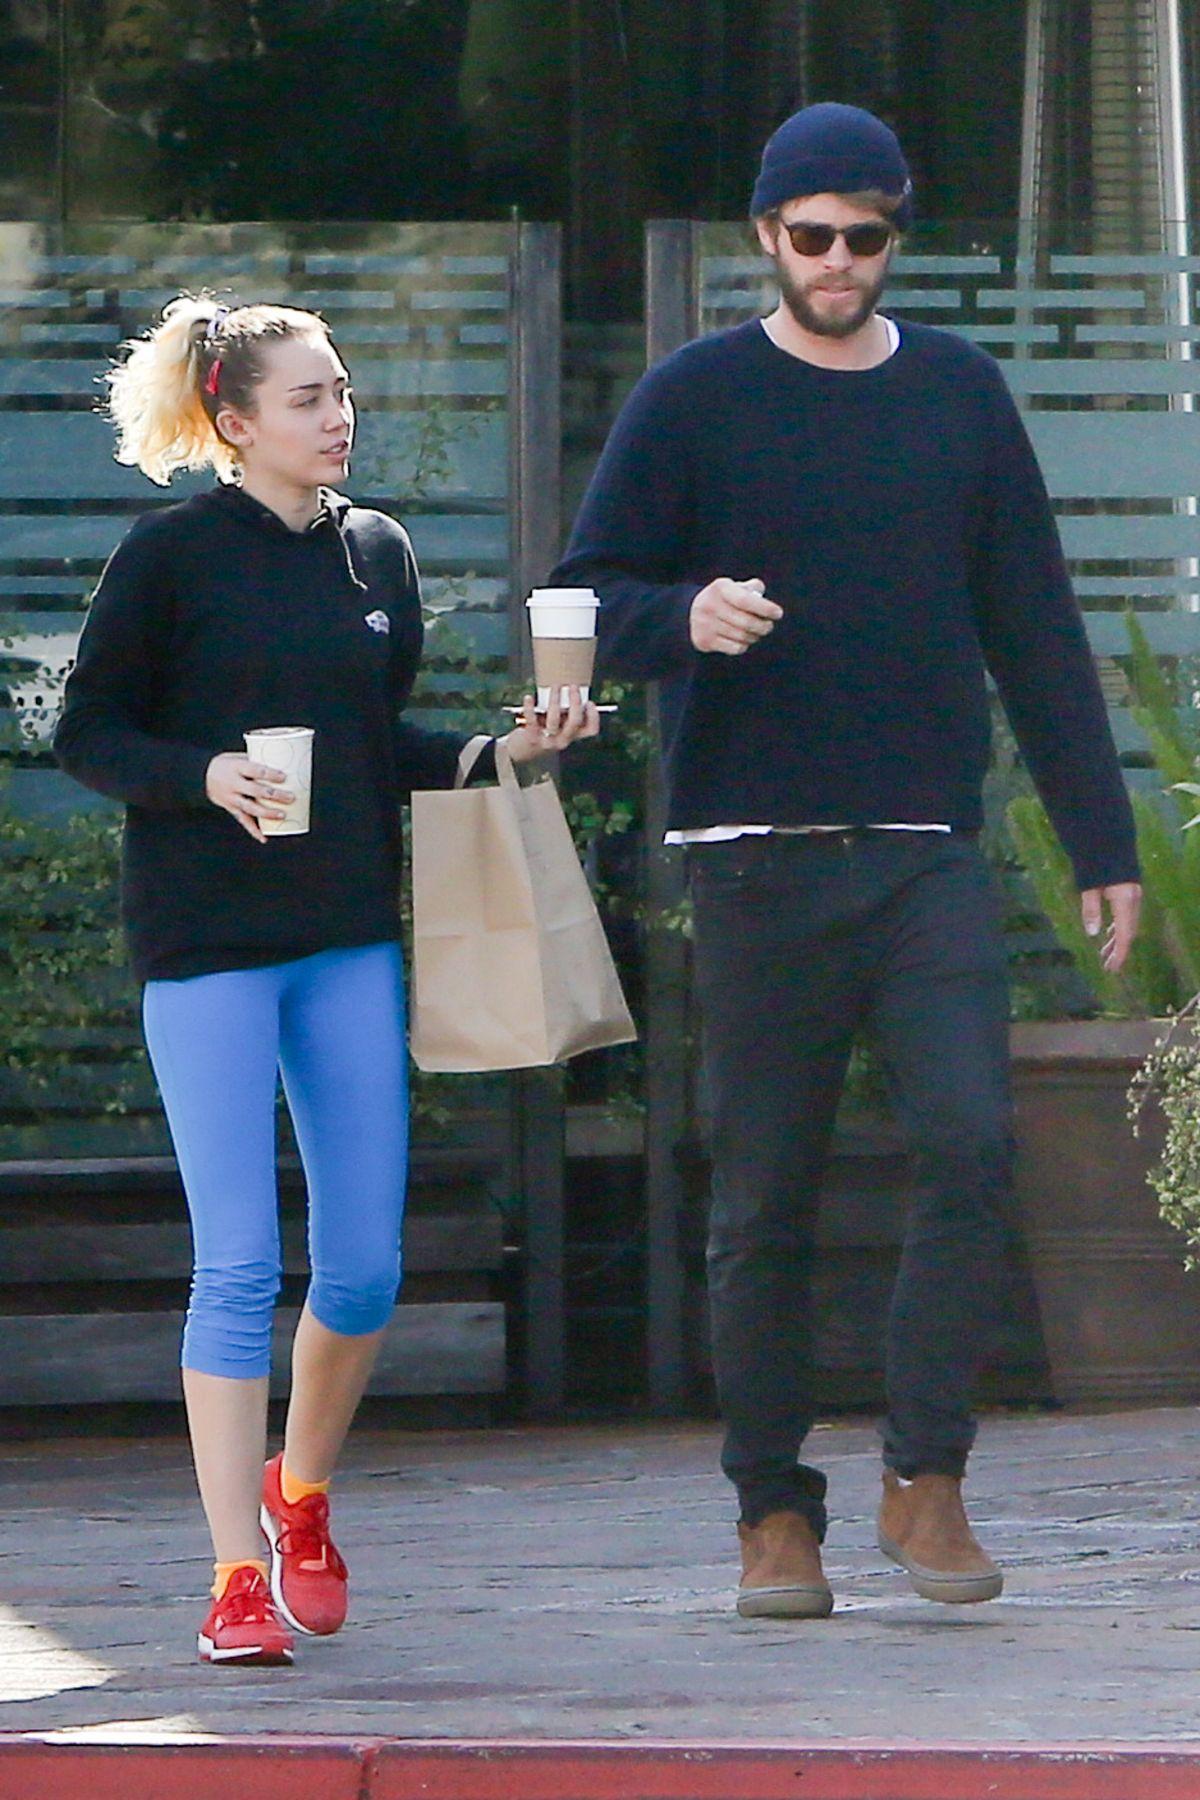 MILEY CYRUS and Liam Hemsworth Leaves Ollo Restaurant in Malibu 02/07/2017